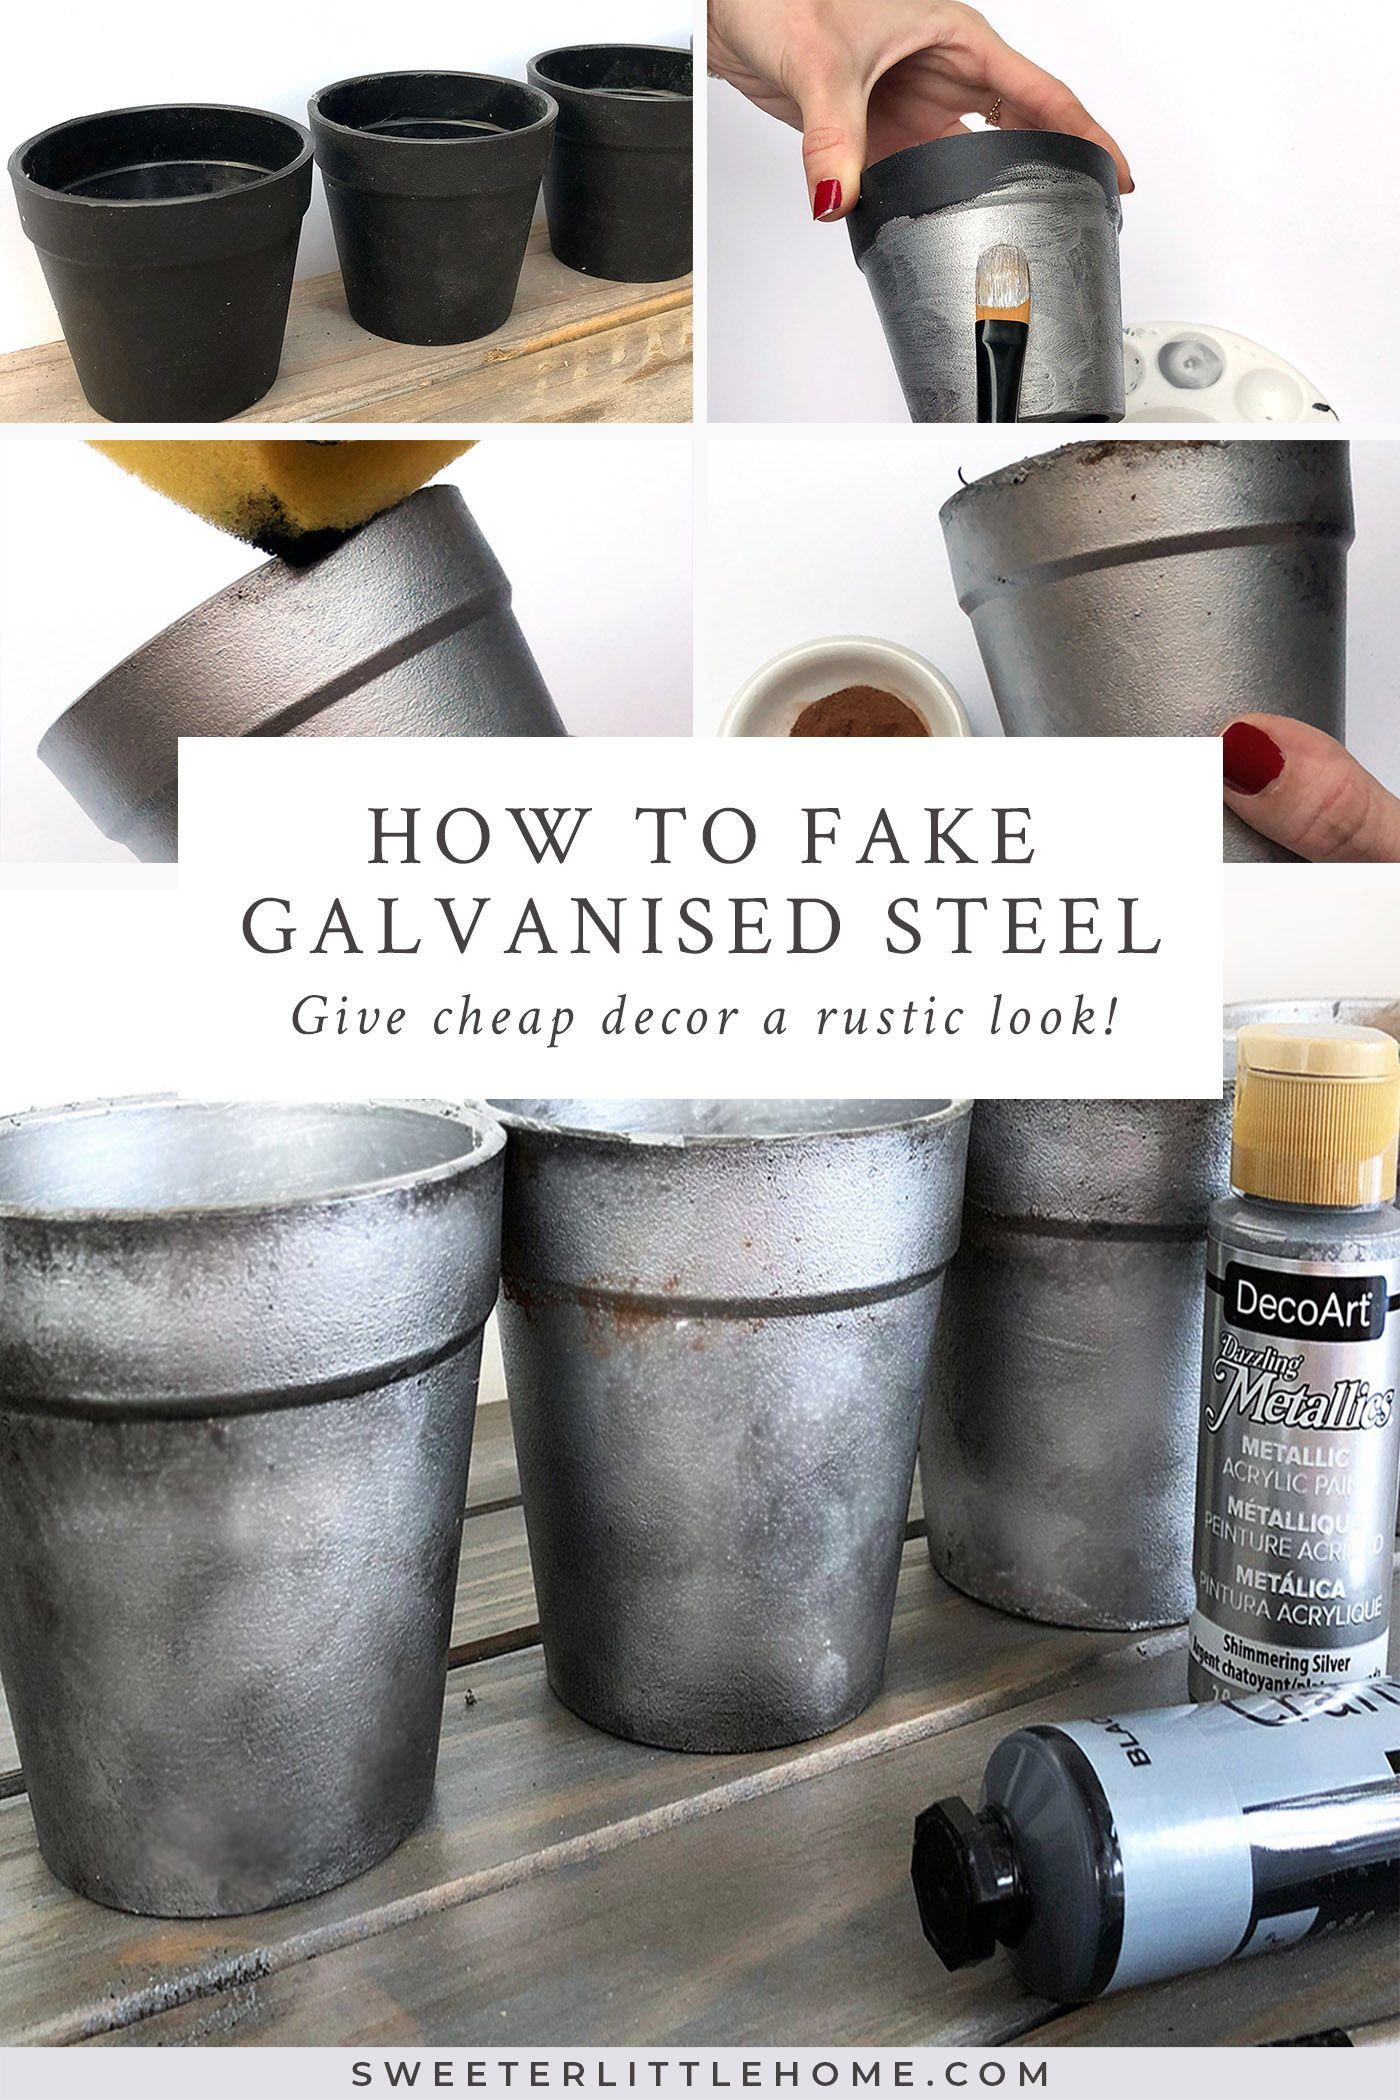 How To Fake Galvanised Steel The Easy Way Galvanized Decor Metal Tree Trendy Home Decor